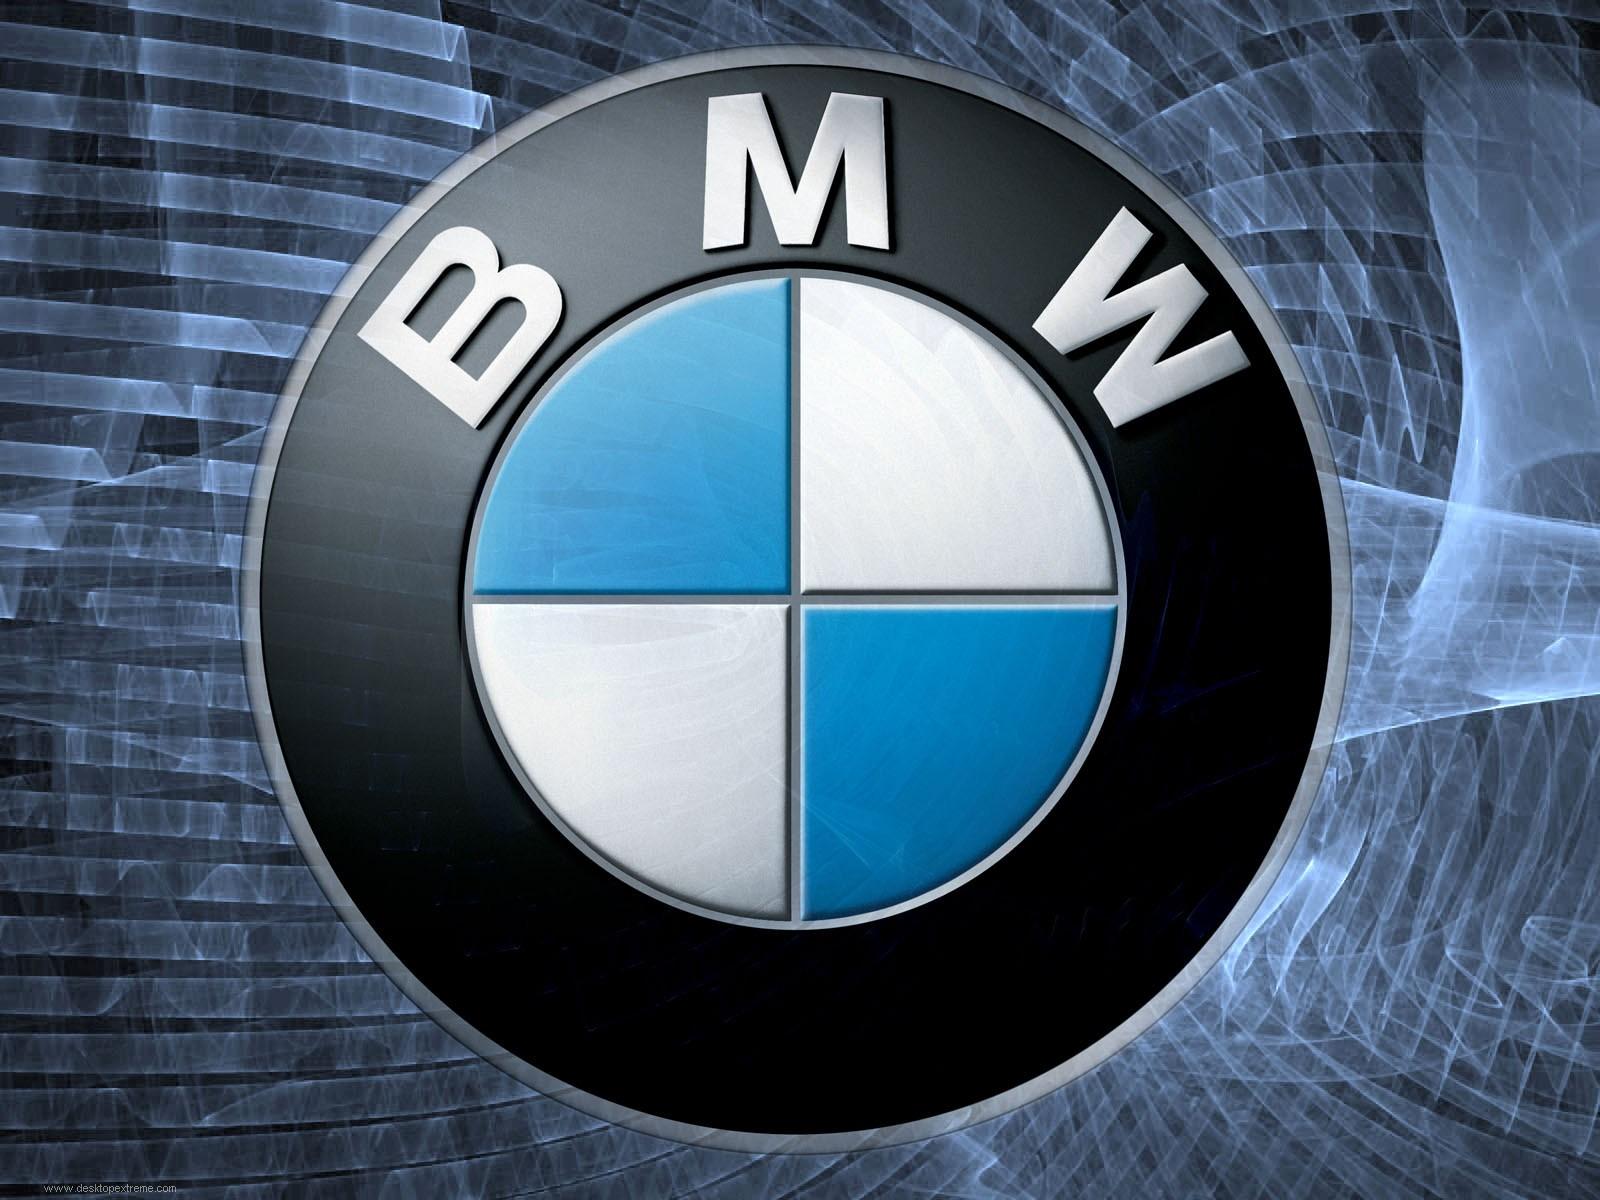 One model of bmw logo